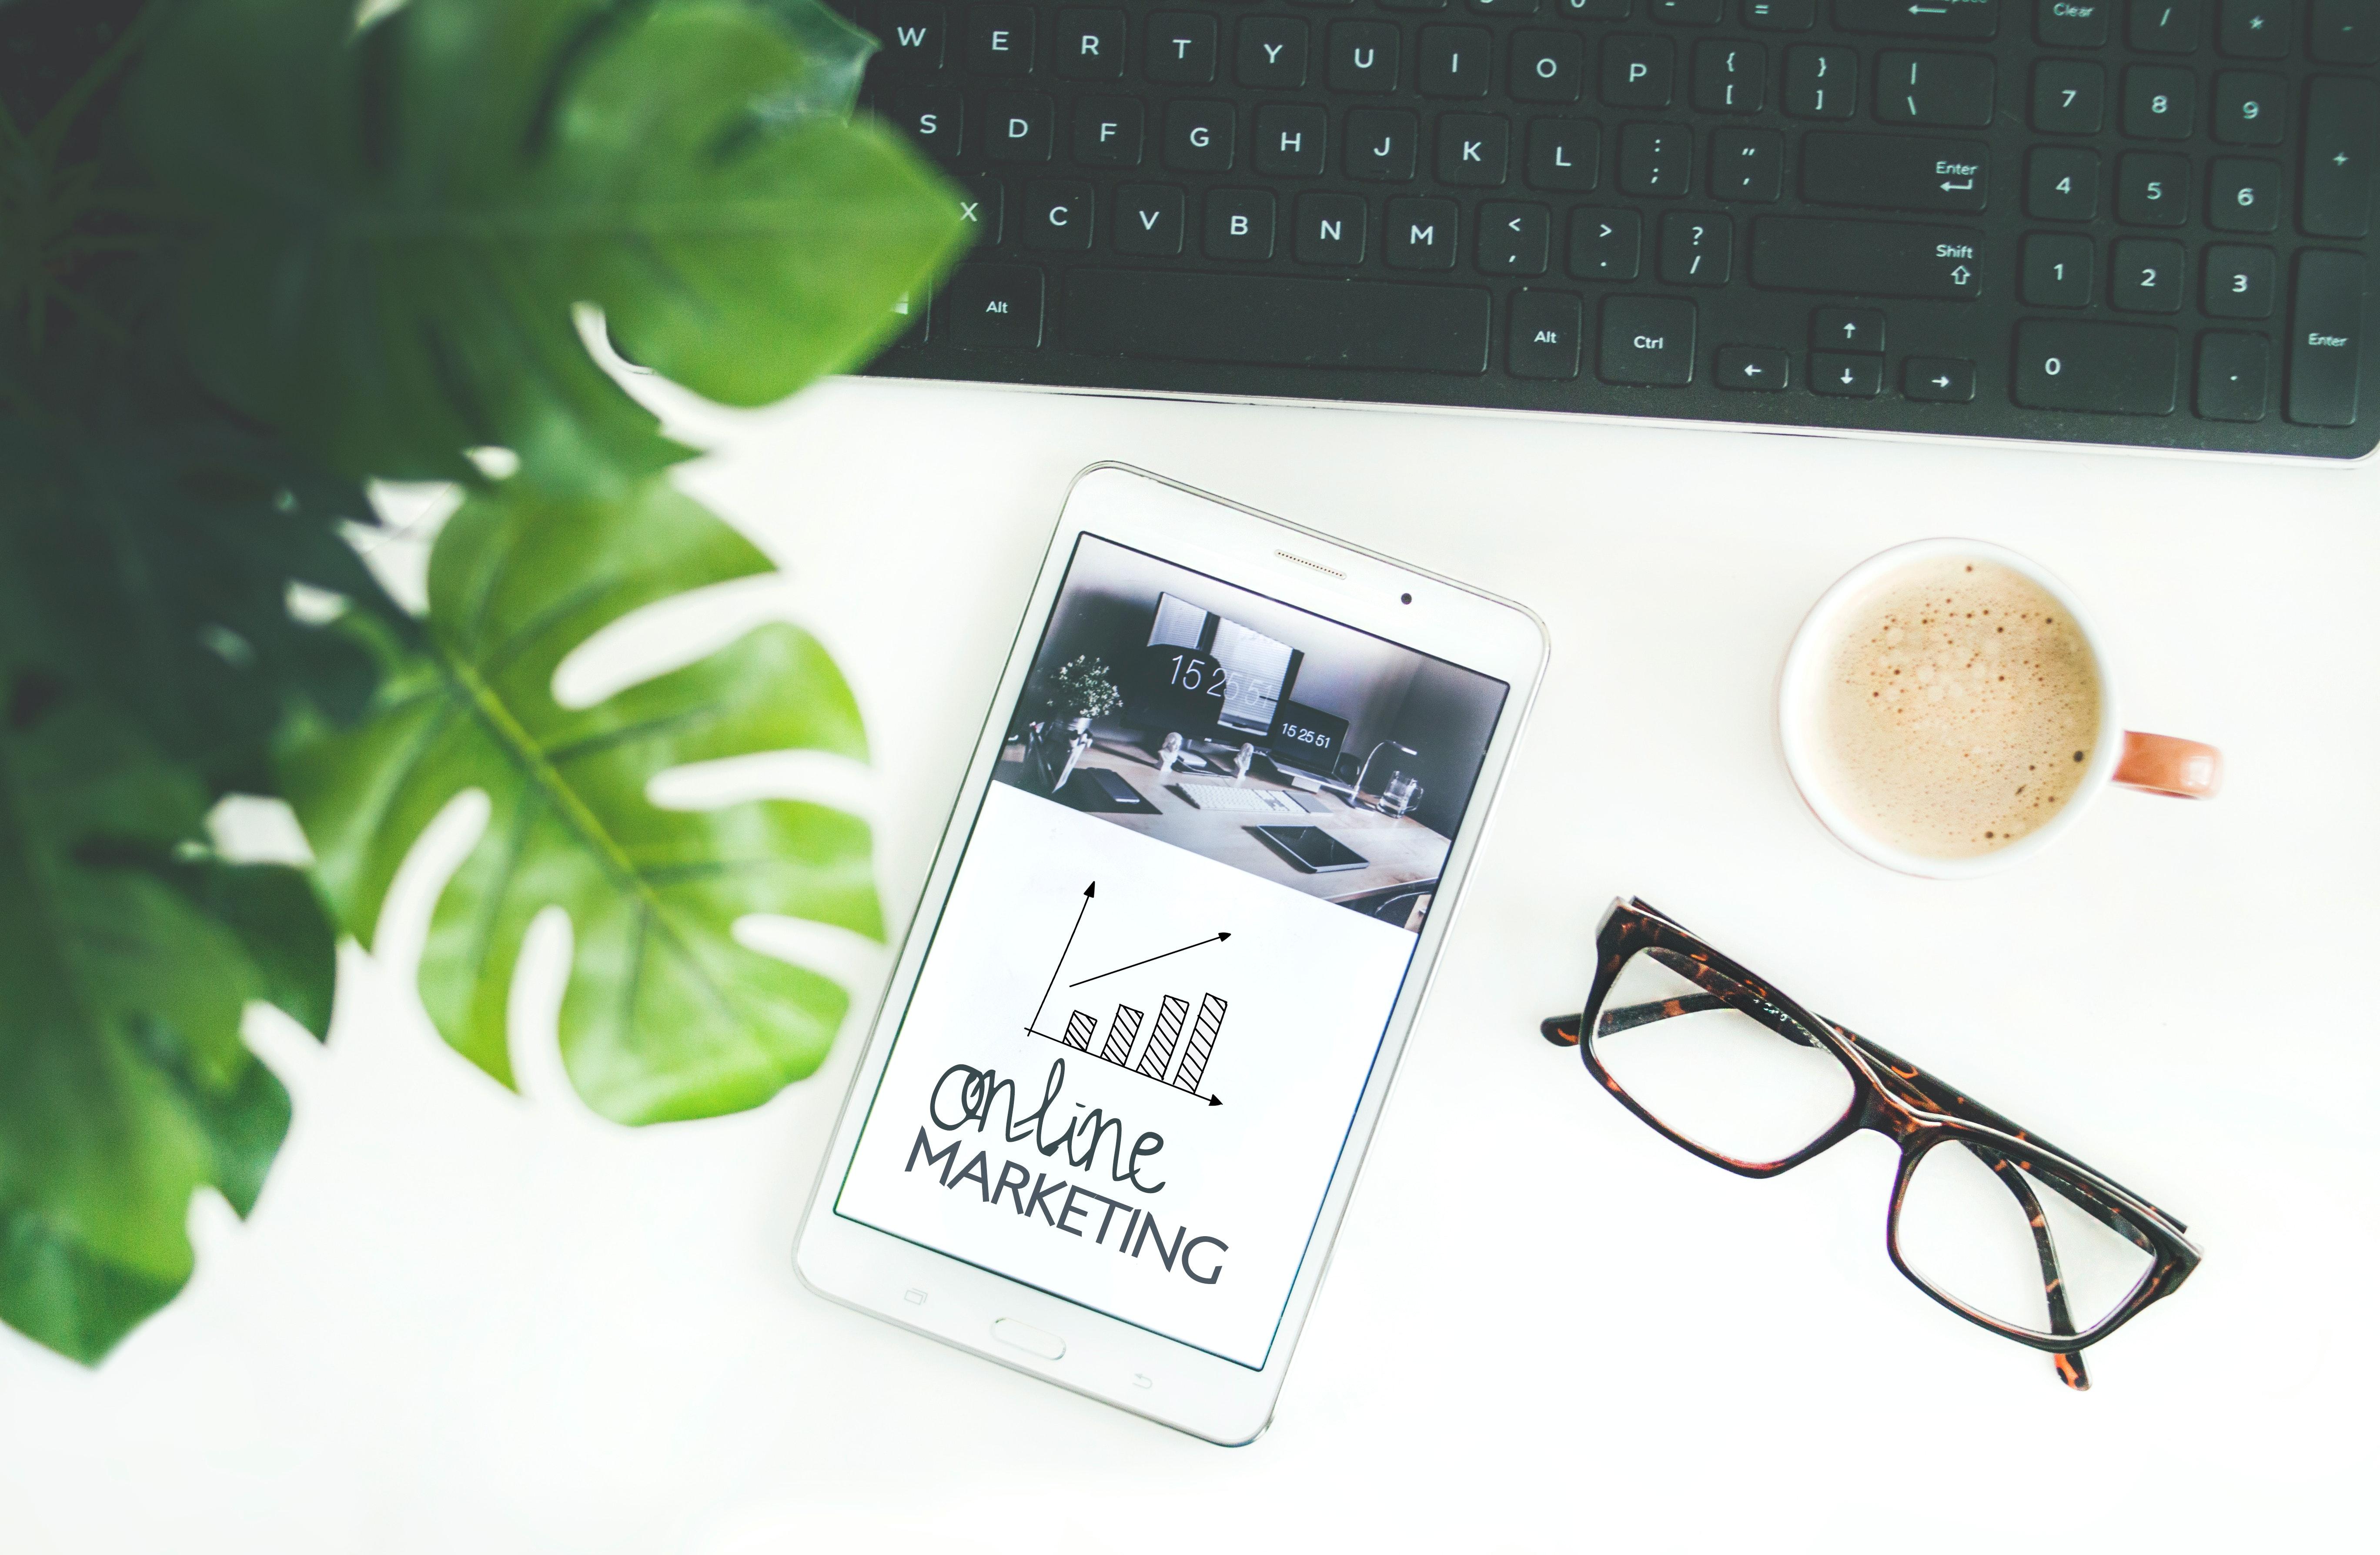 Digital marketing, Photo by Dominika Roseclay from Pexels